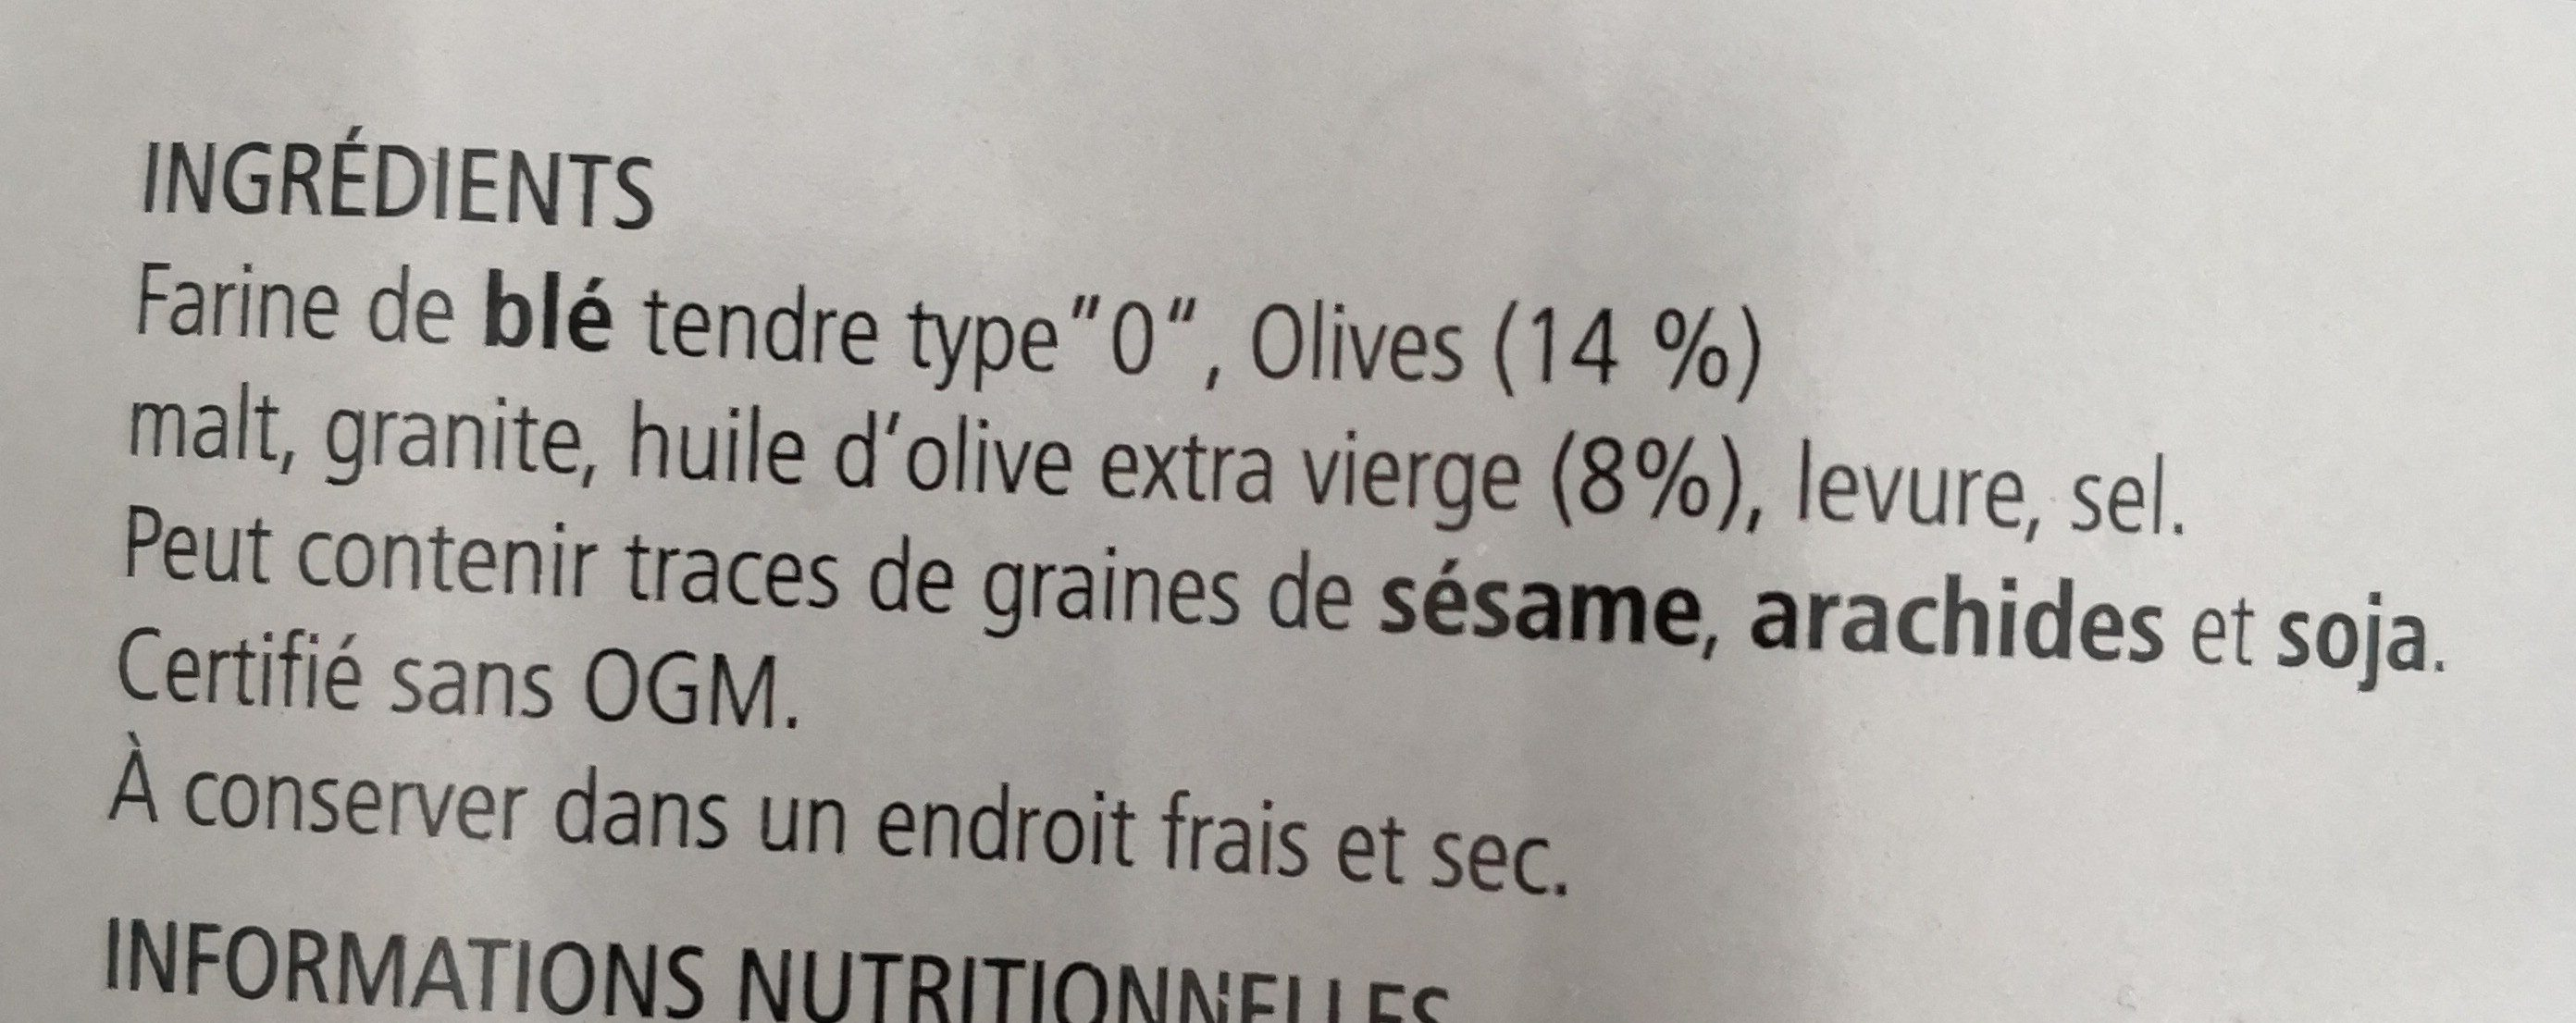 Grissini alle olive - Ingrediënten - fr